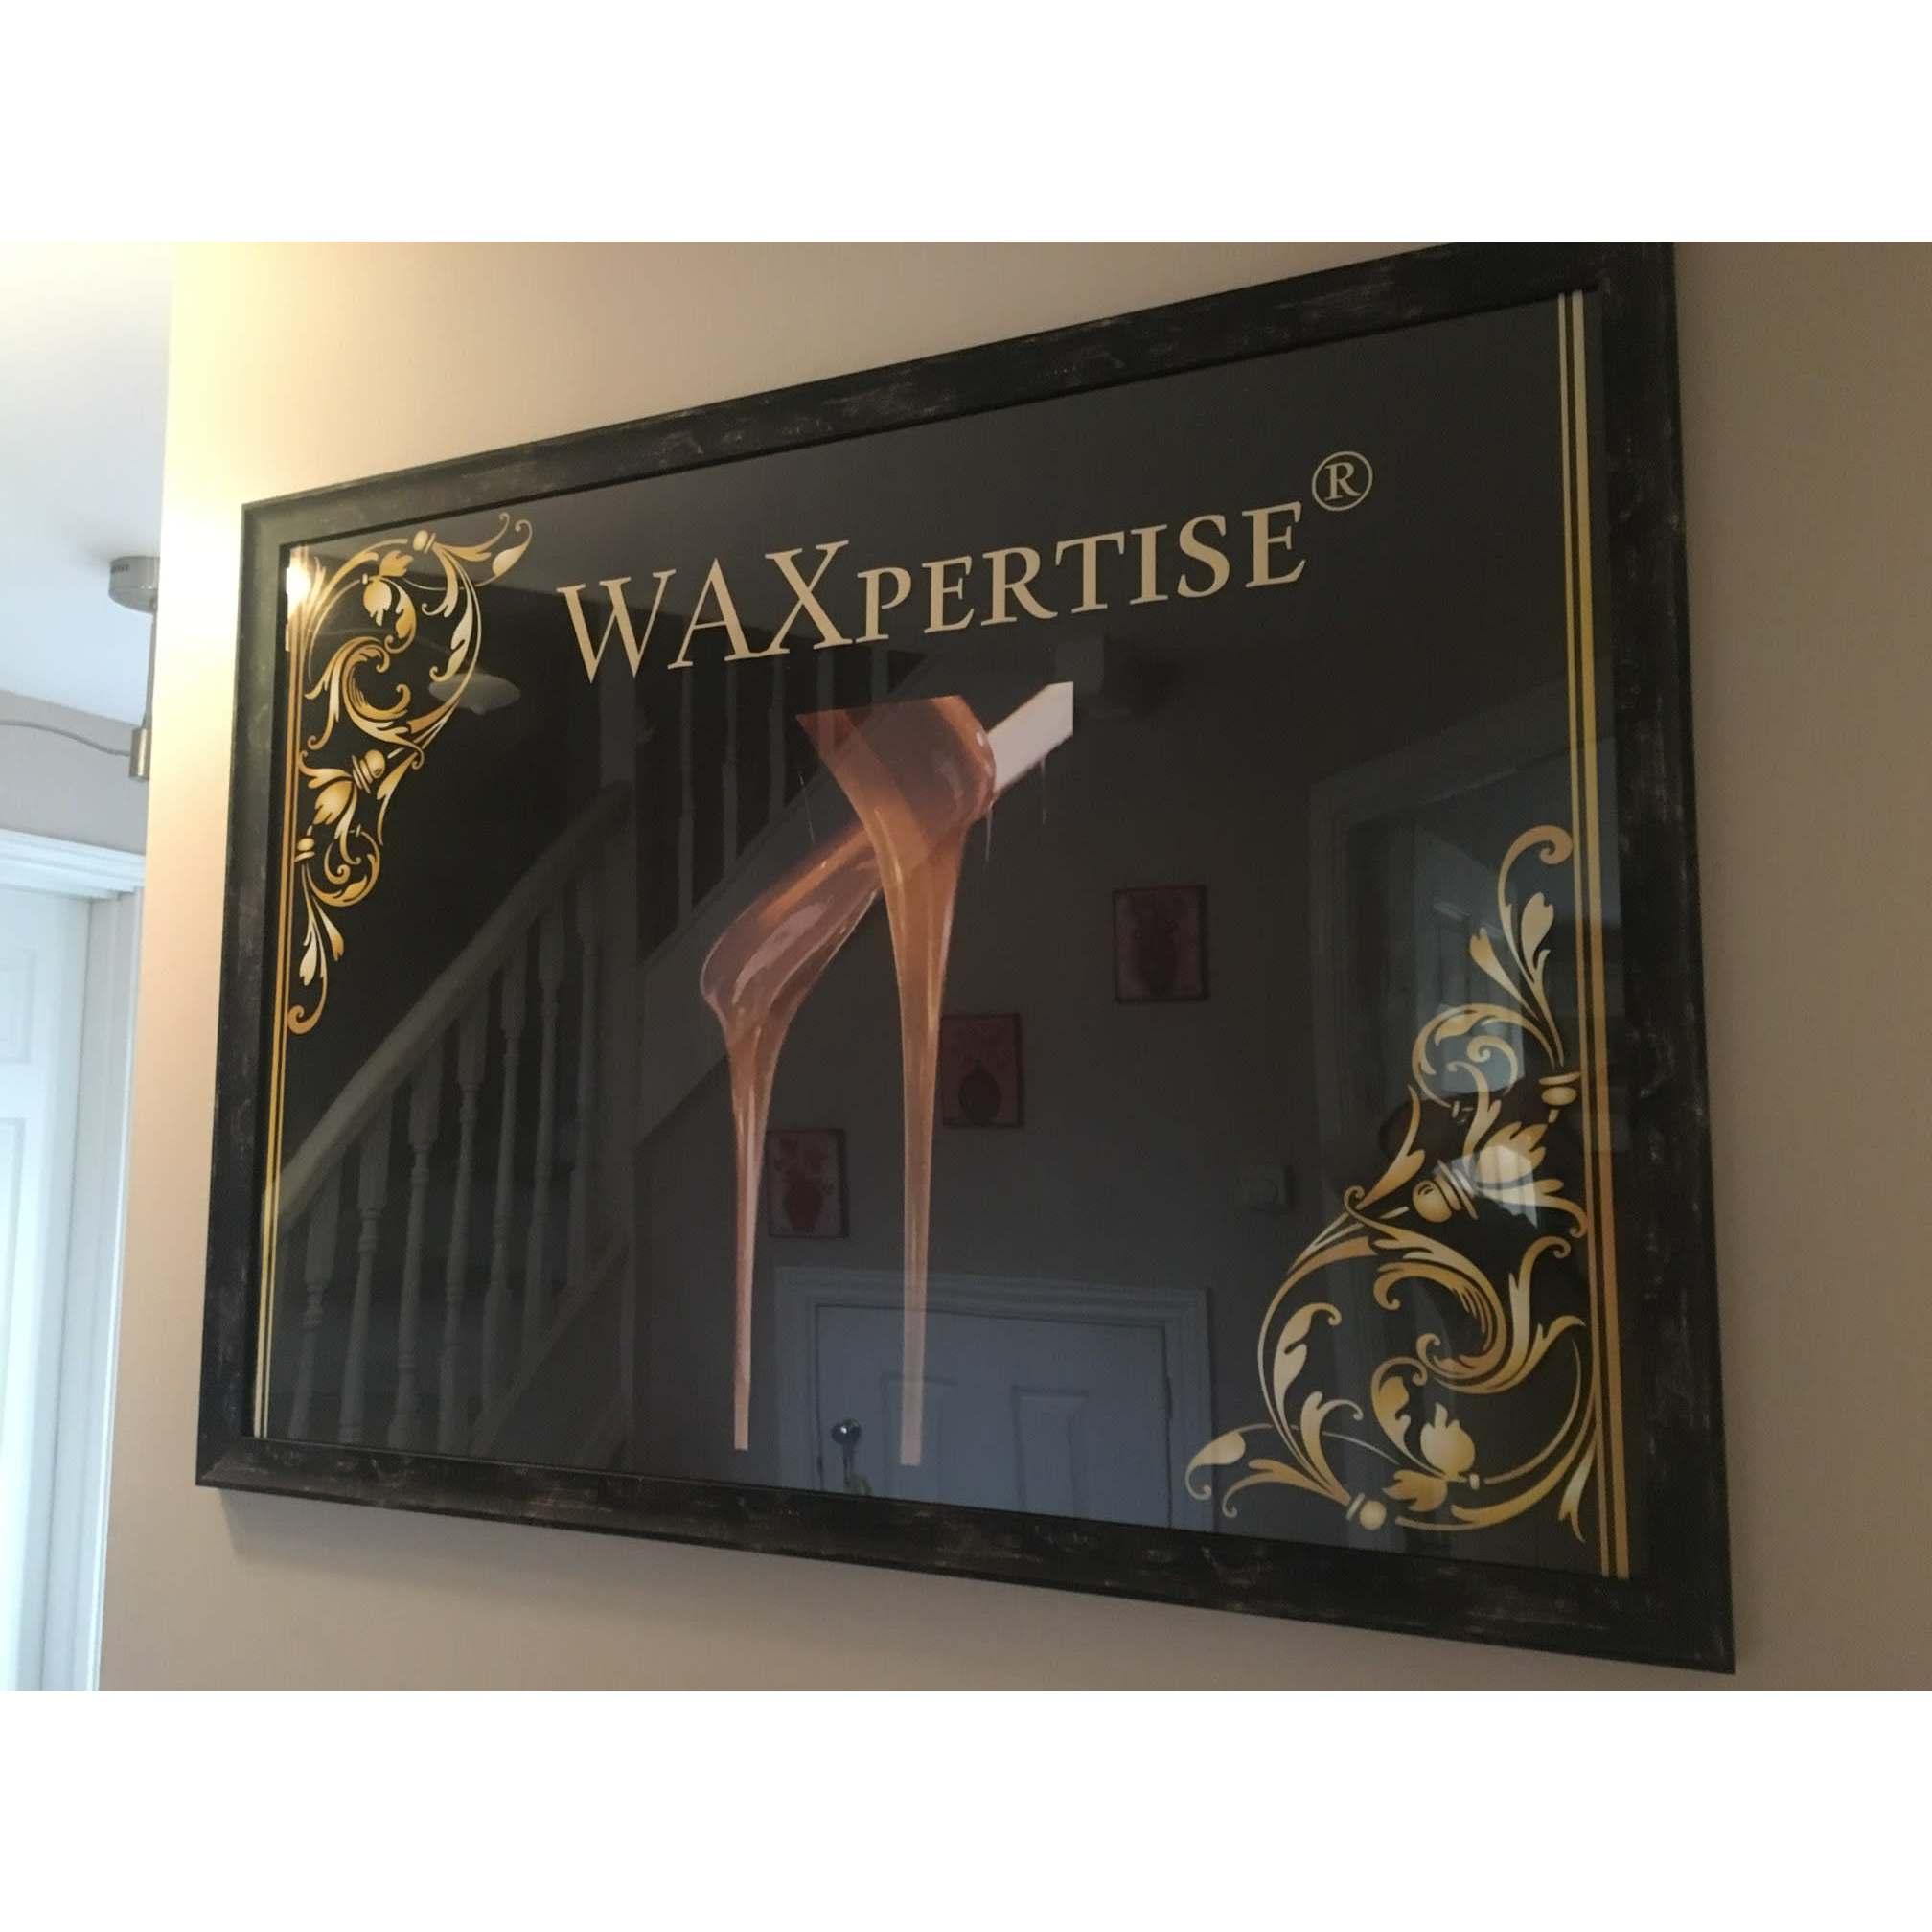 Waxpertise